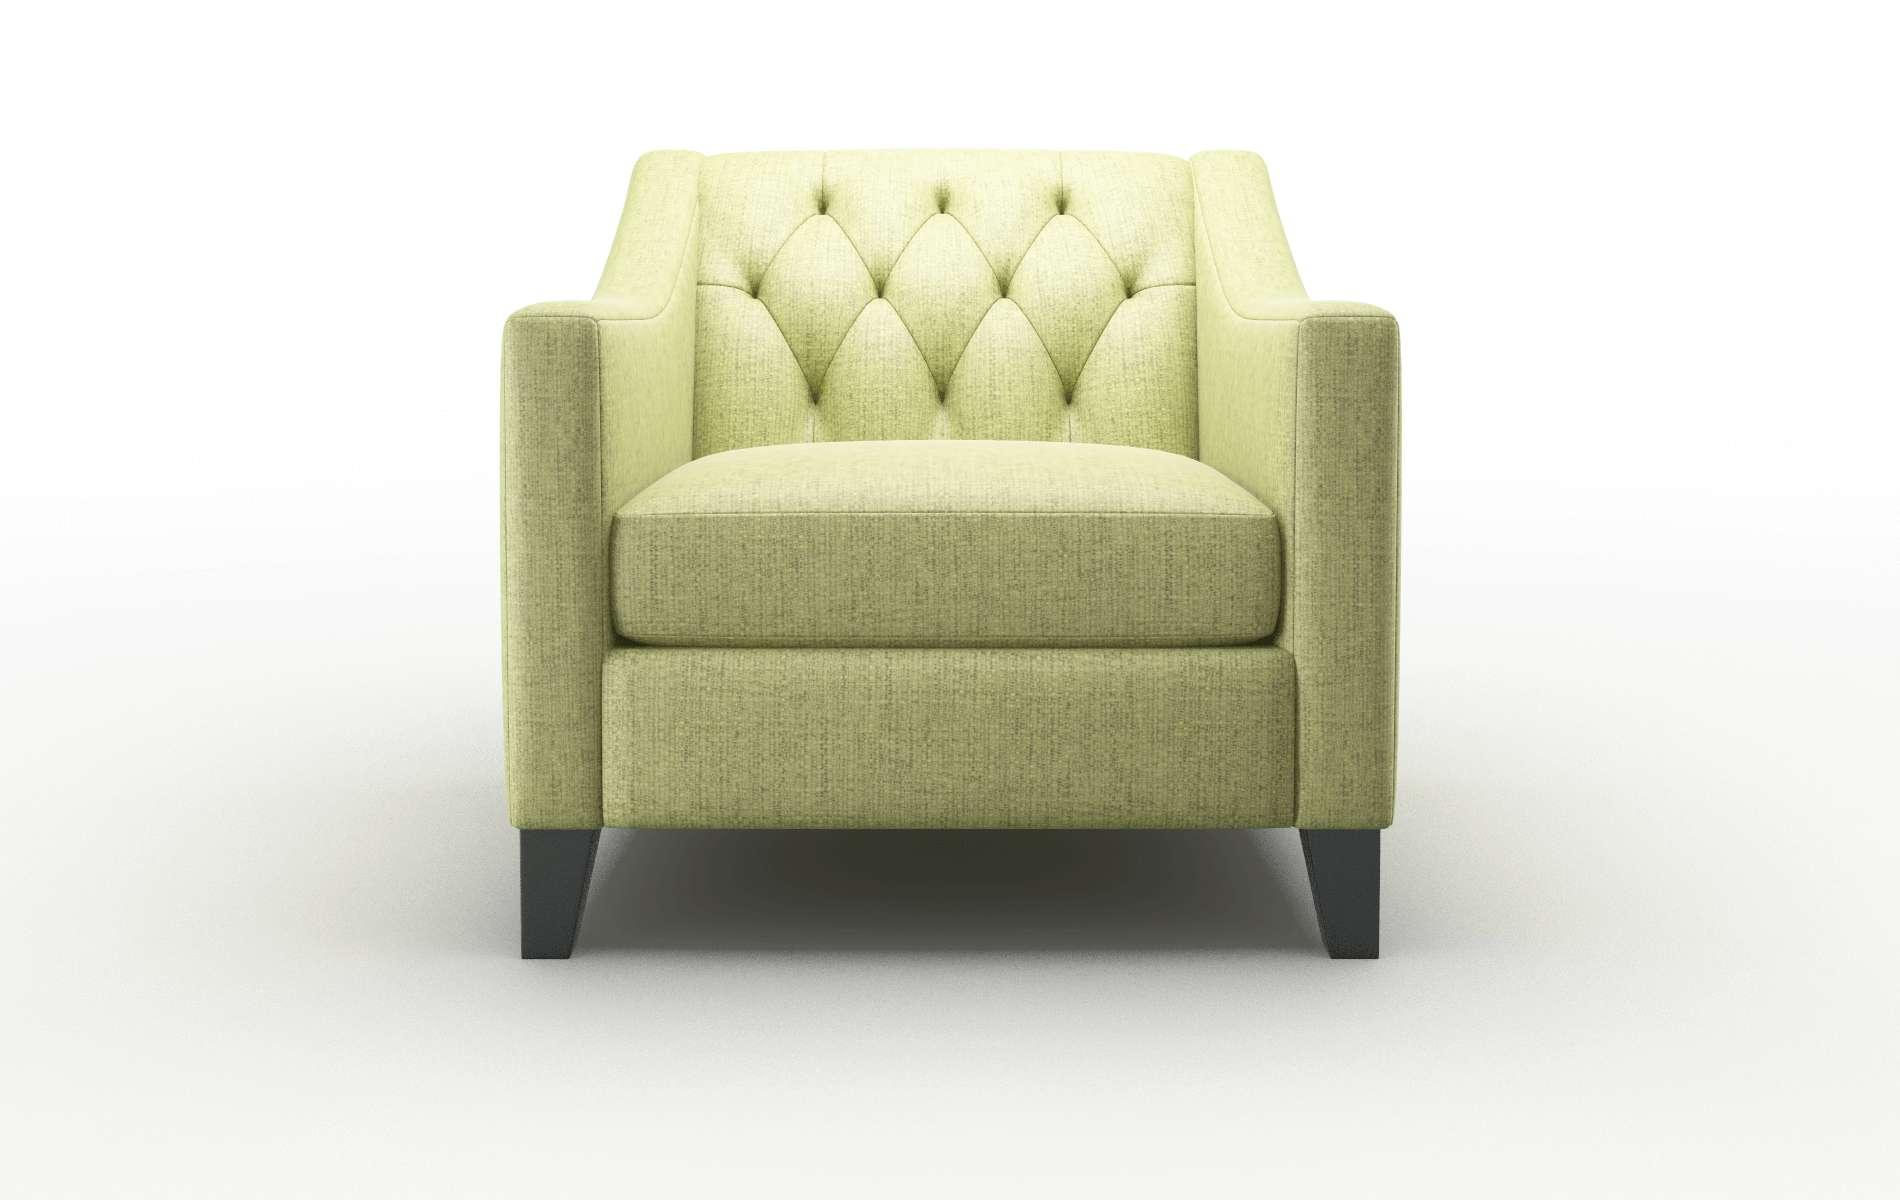 Seville Notion Appletini Chair espresso legs 1